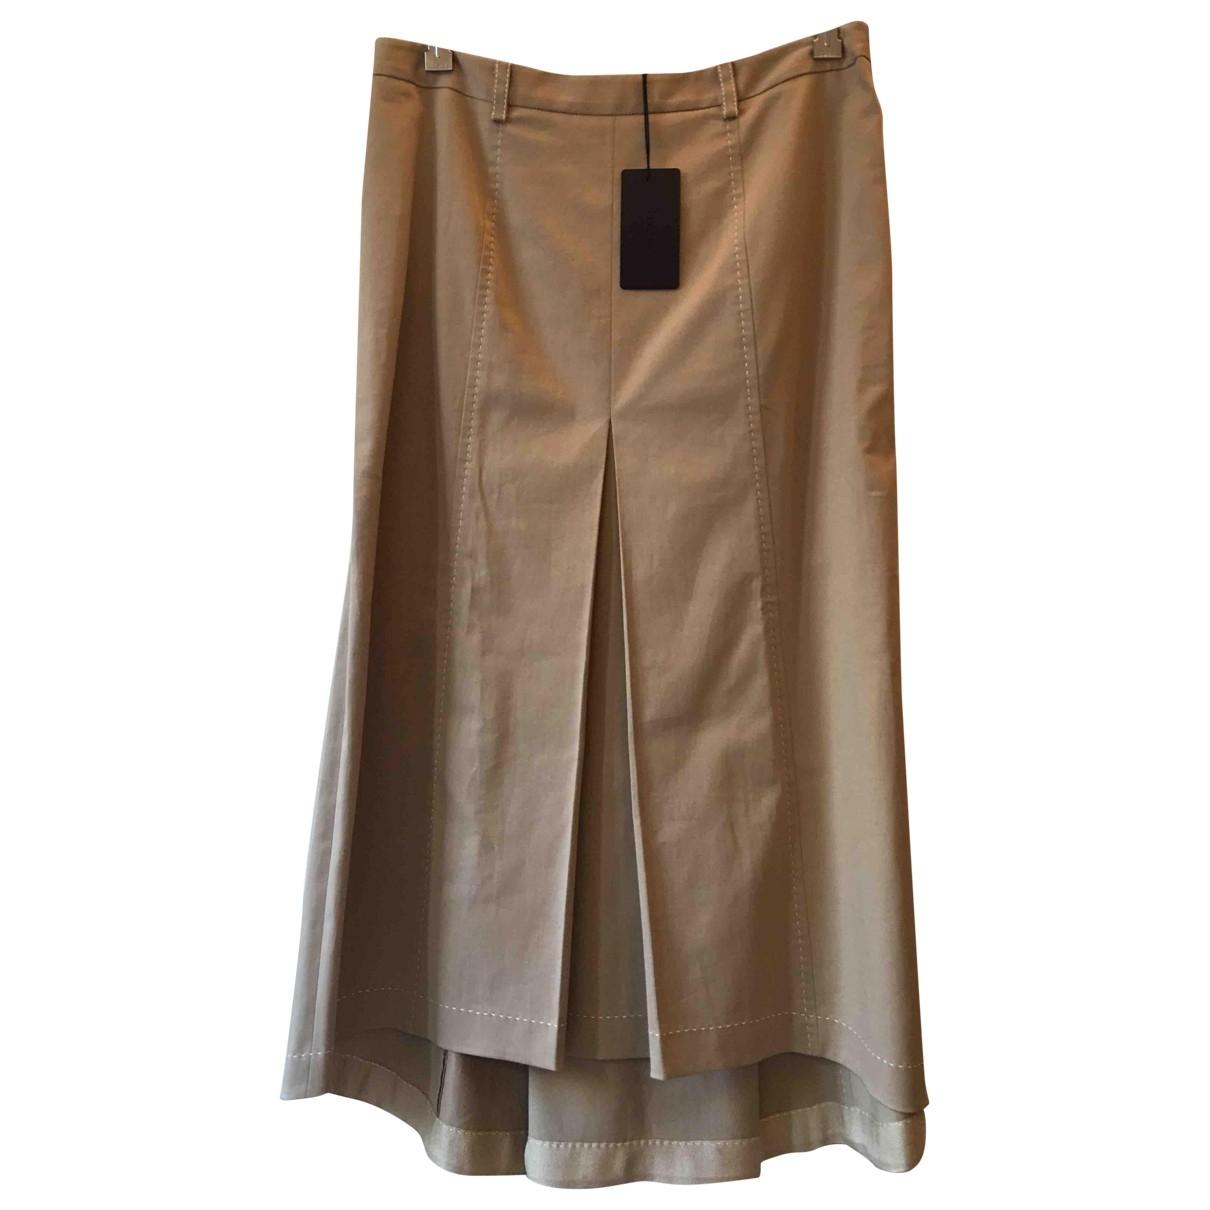 Prada \N Beige Cotton skirt for Women 42 IT